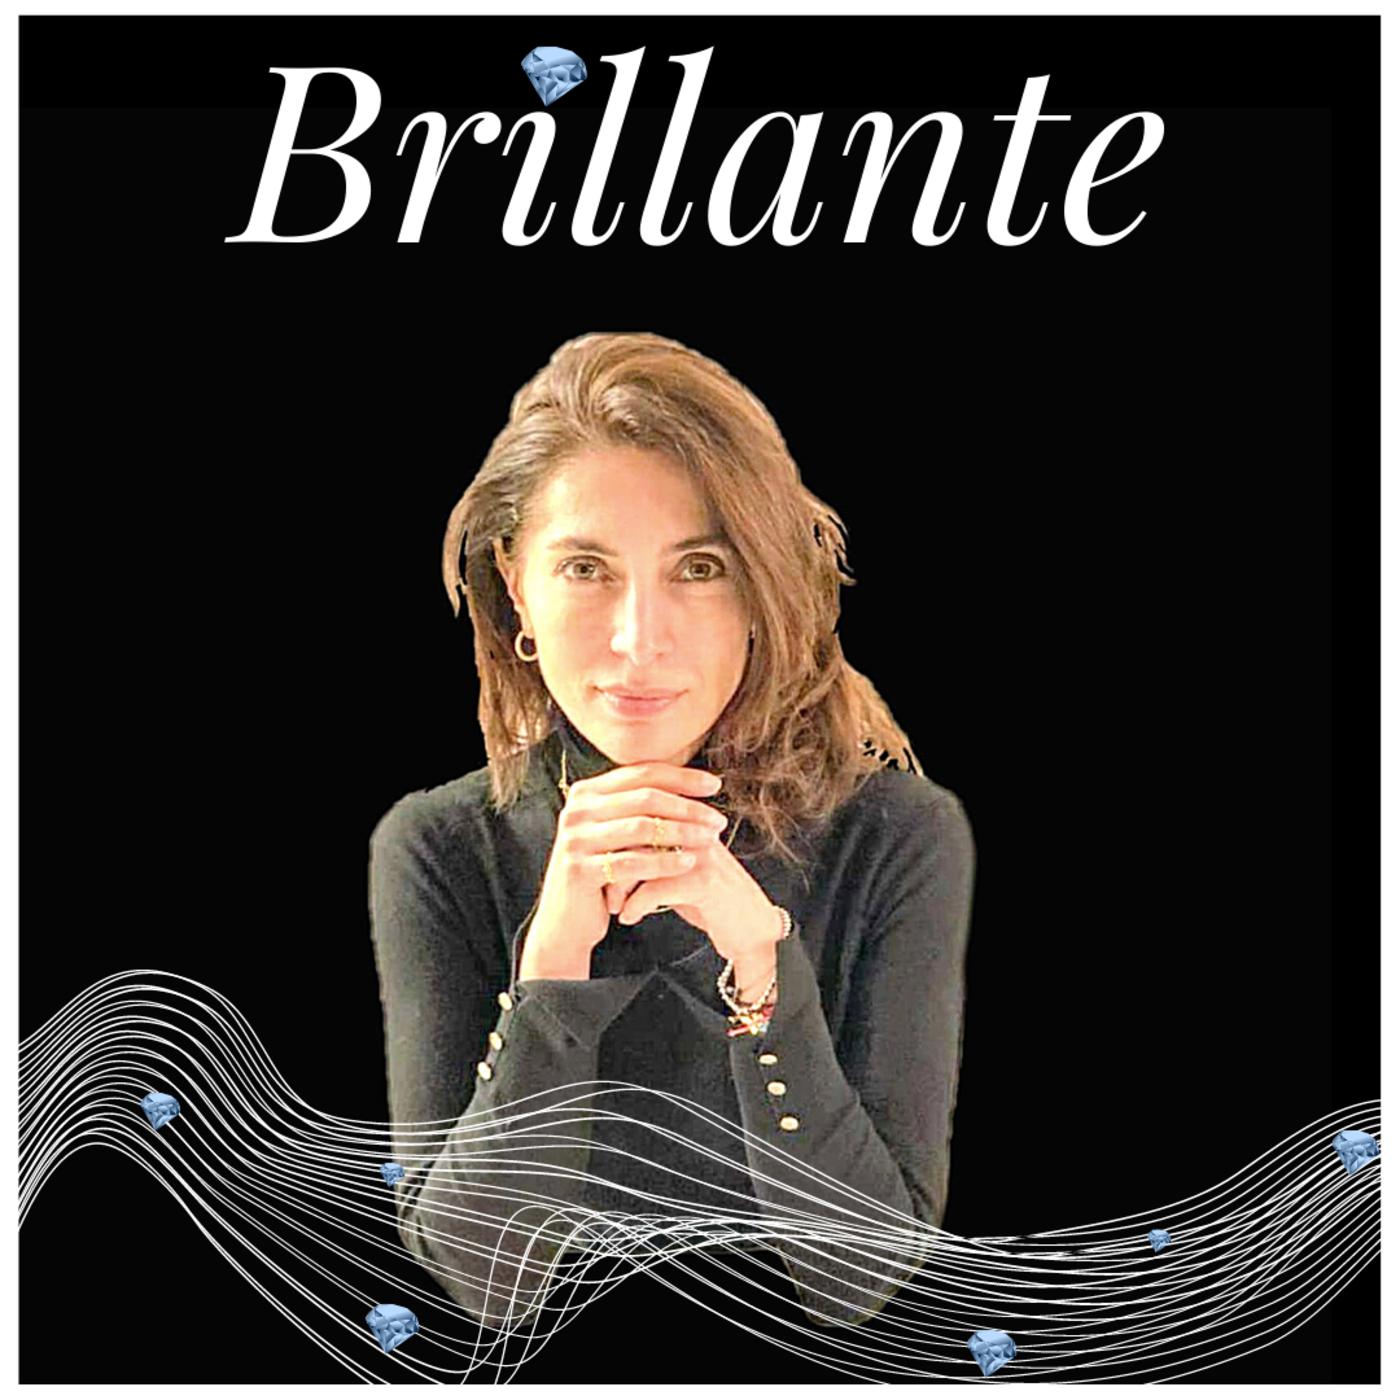 Brillante #5 Caterina Murino, actrice et joaillière engagée